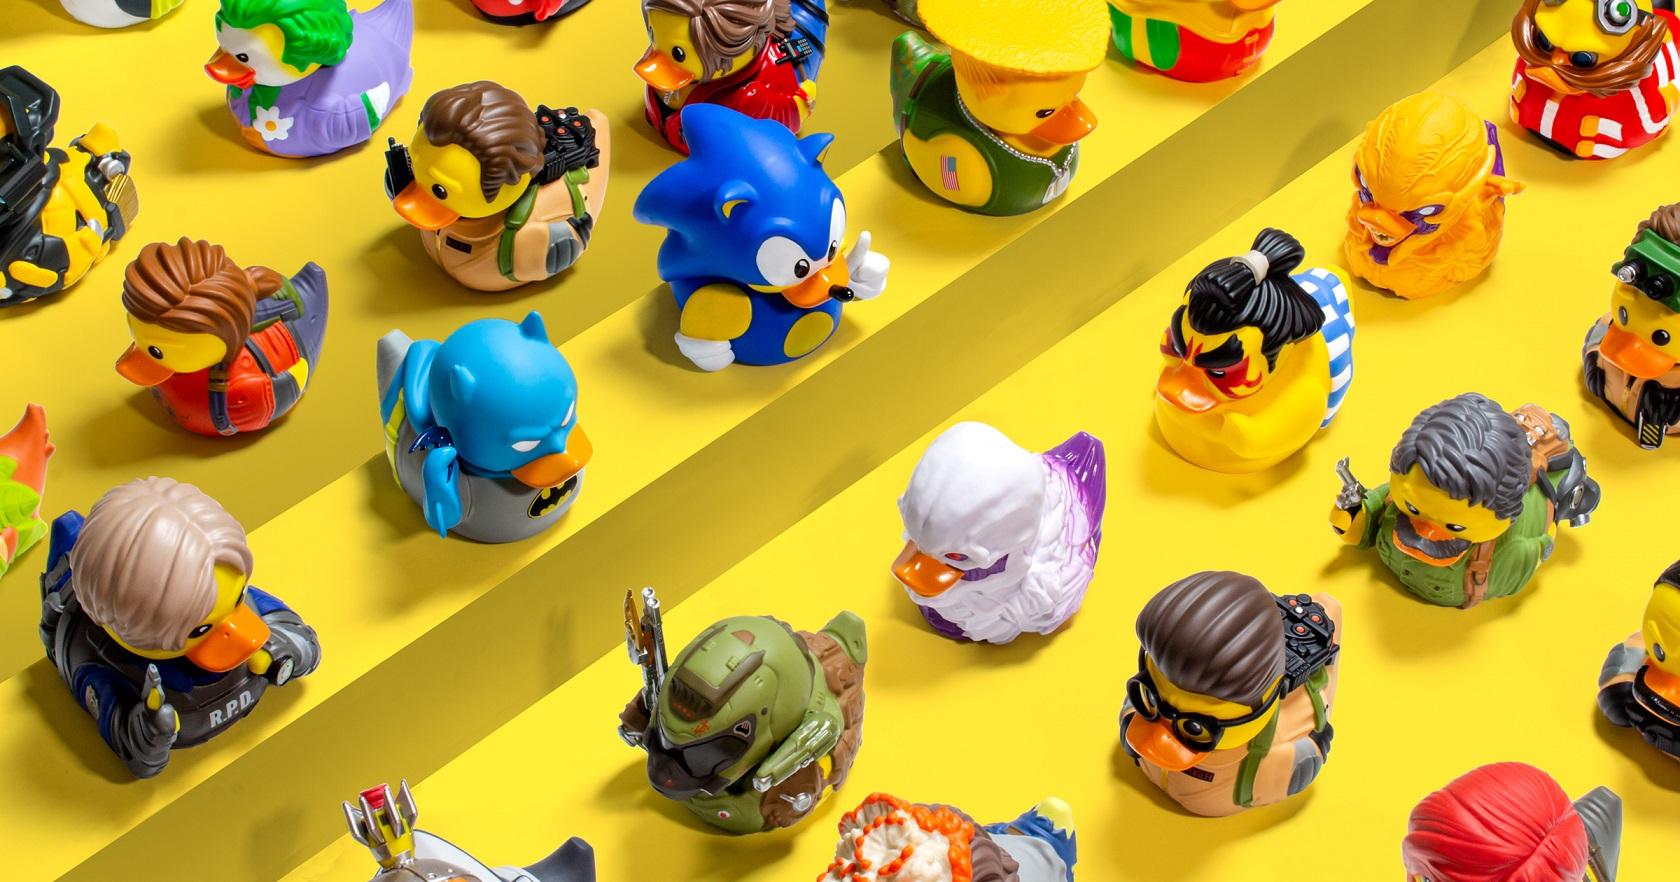 geek nerd rubber ducks